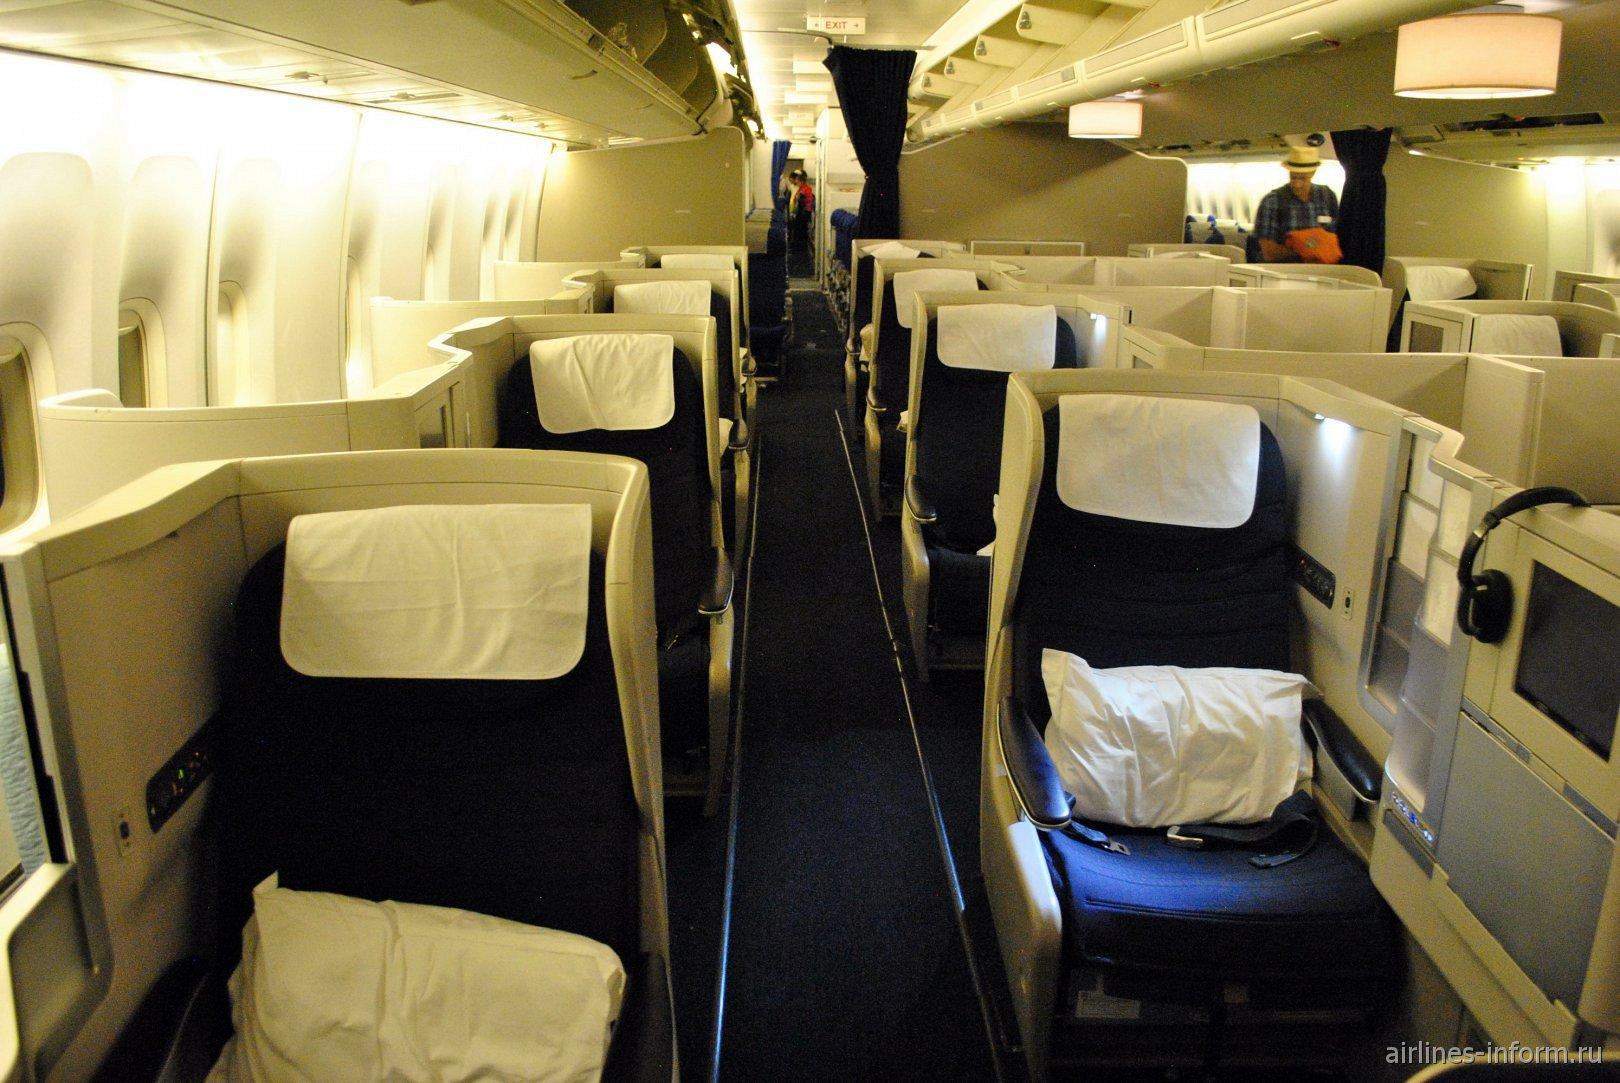 Места J и G бизнес-класса Club World в Боинге-747-400 British Airways